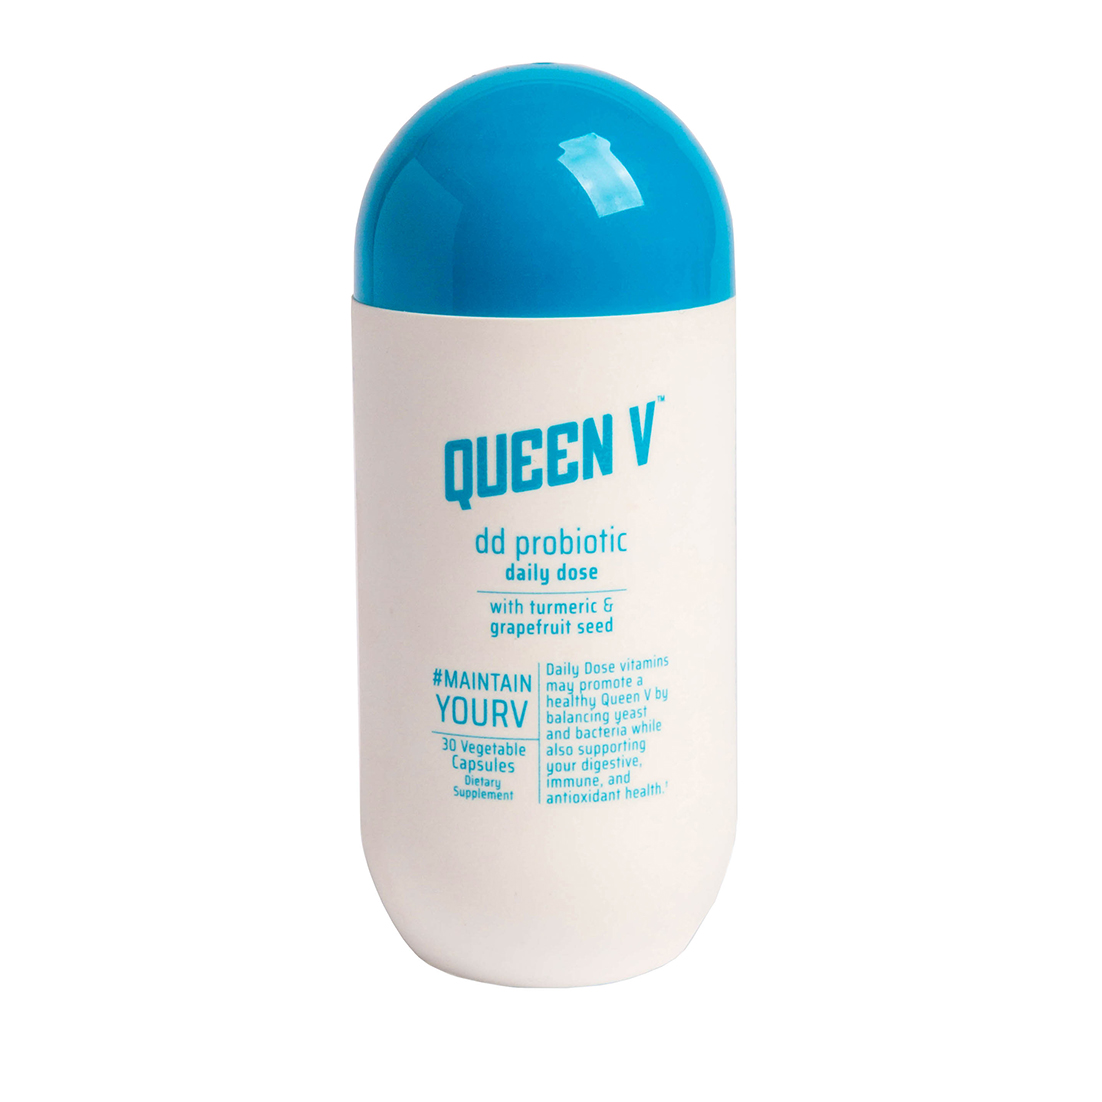 Queen V dd probiotic